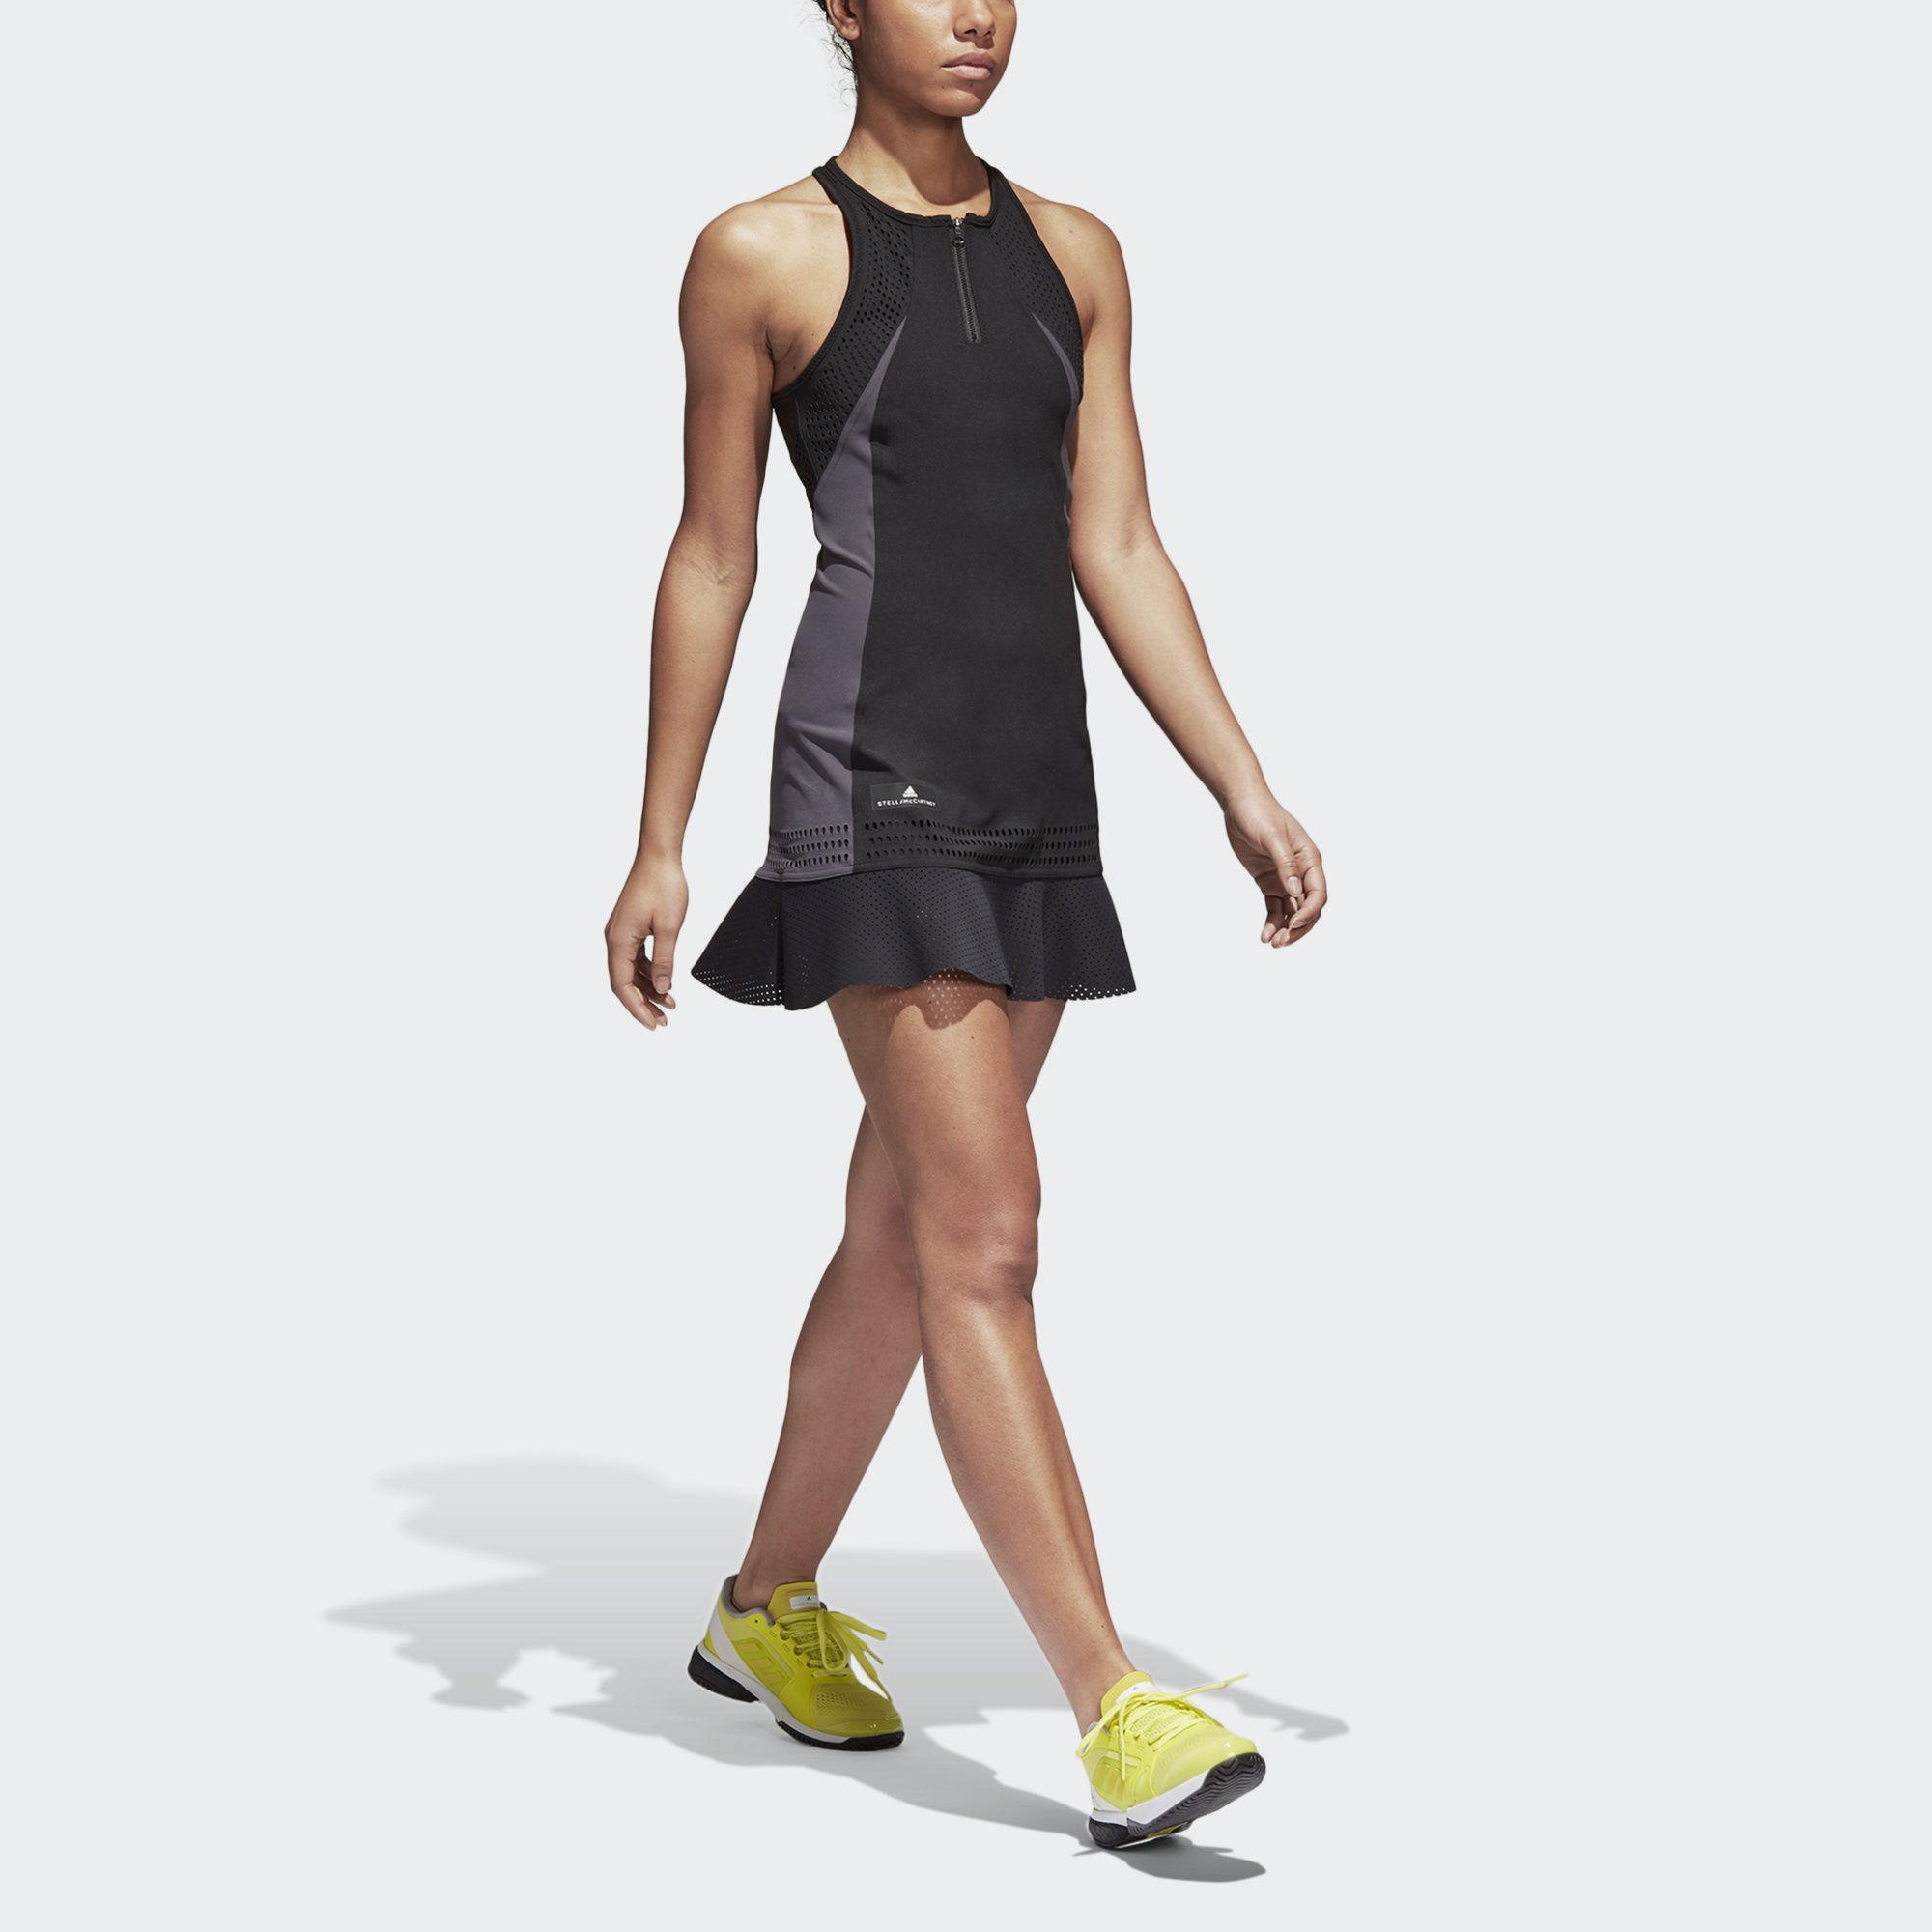 80f08a686e6 Adidas Womens Stella McCartney Barricade Dress - Black - Tennisnuts.com